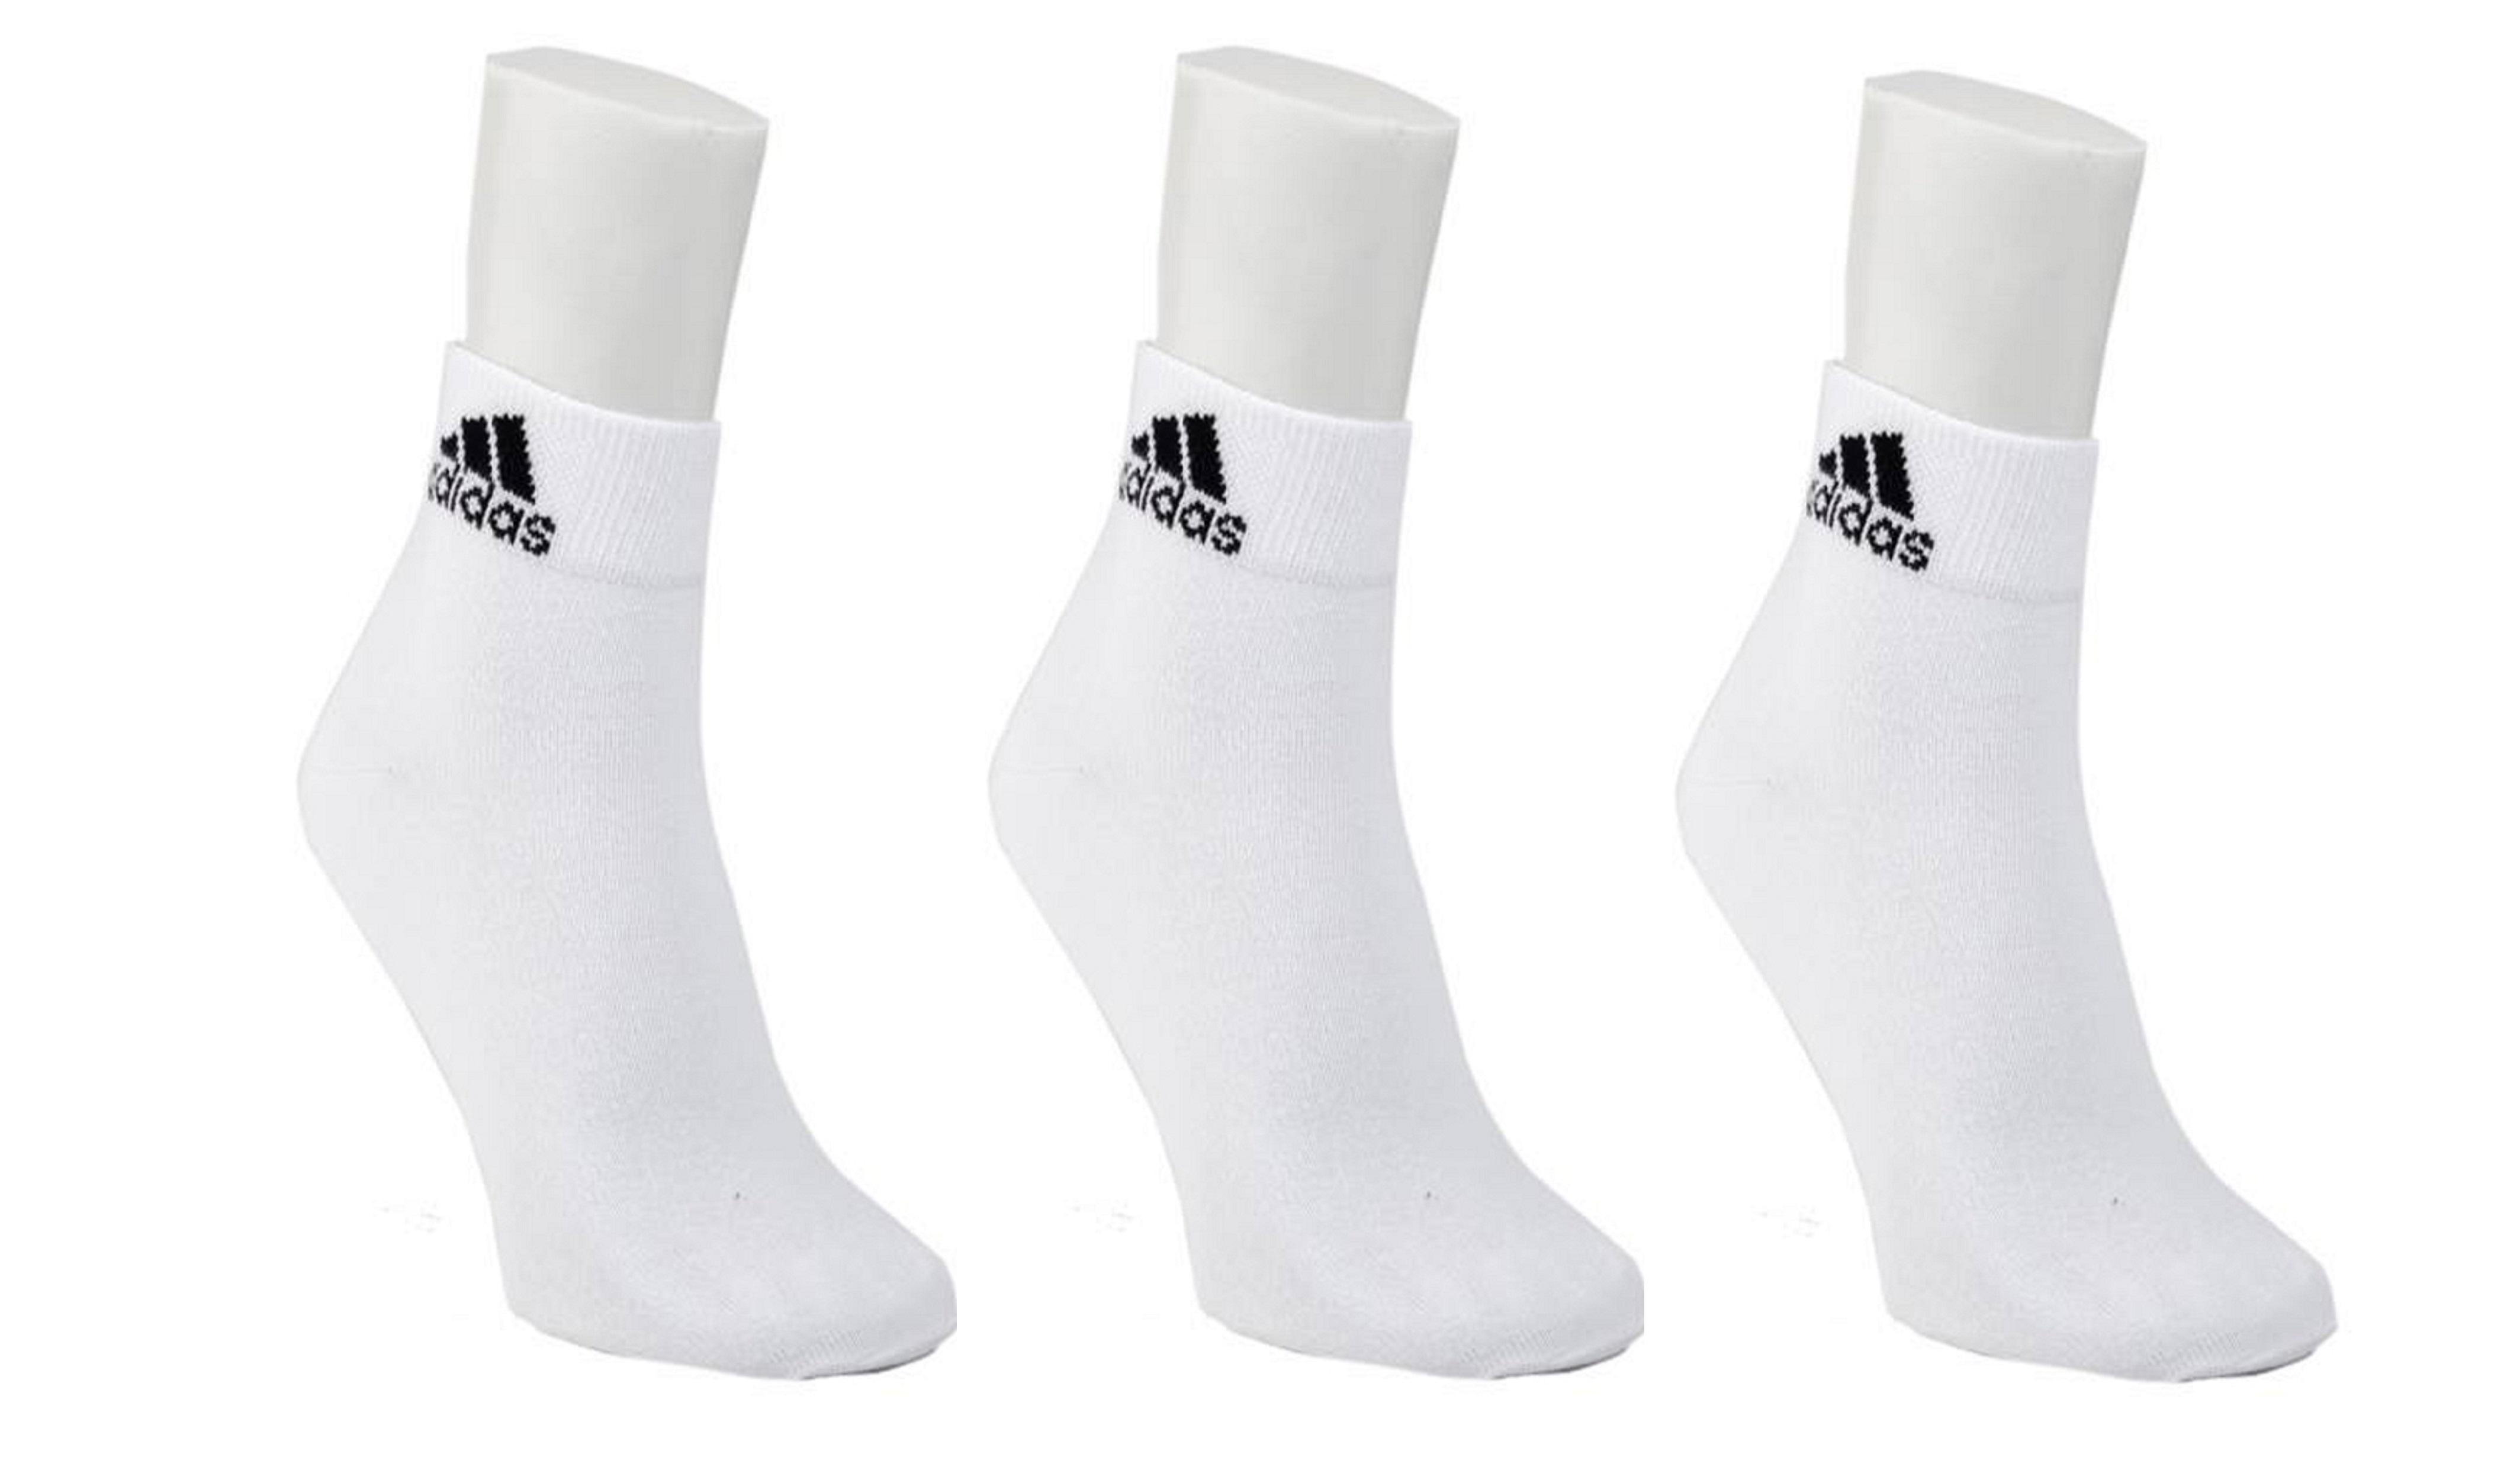 Adidas White Cotton Ankle Length Socks   3 Pairs